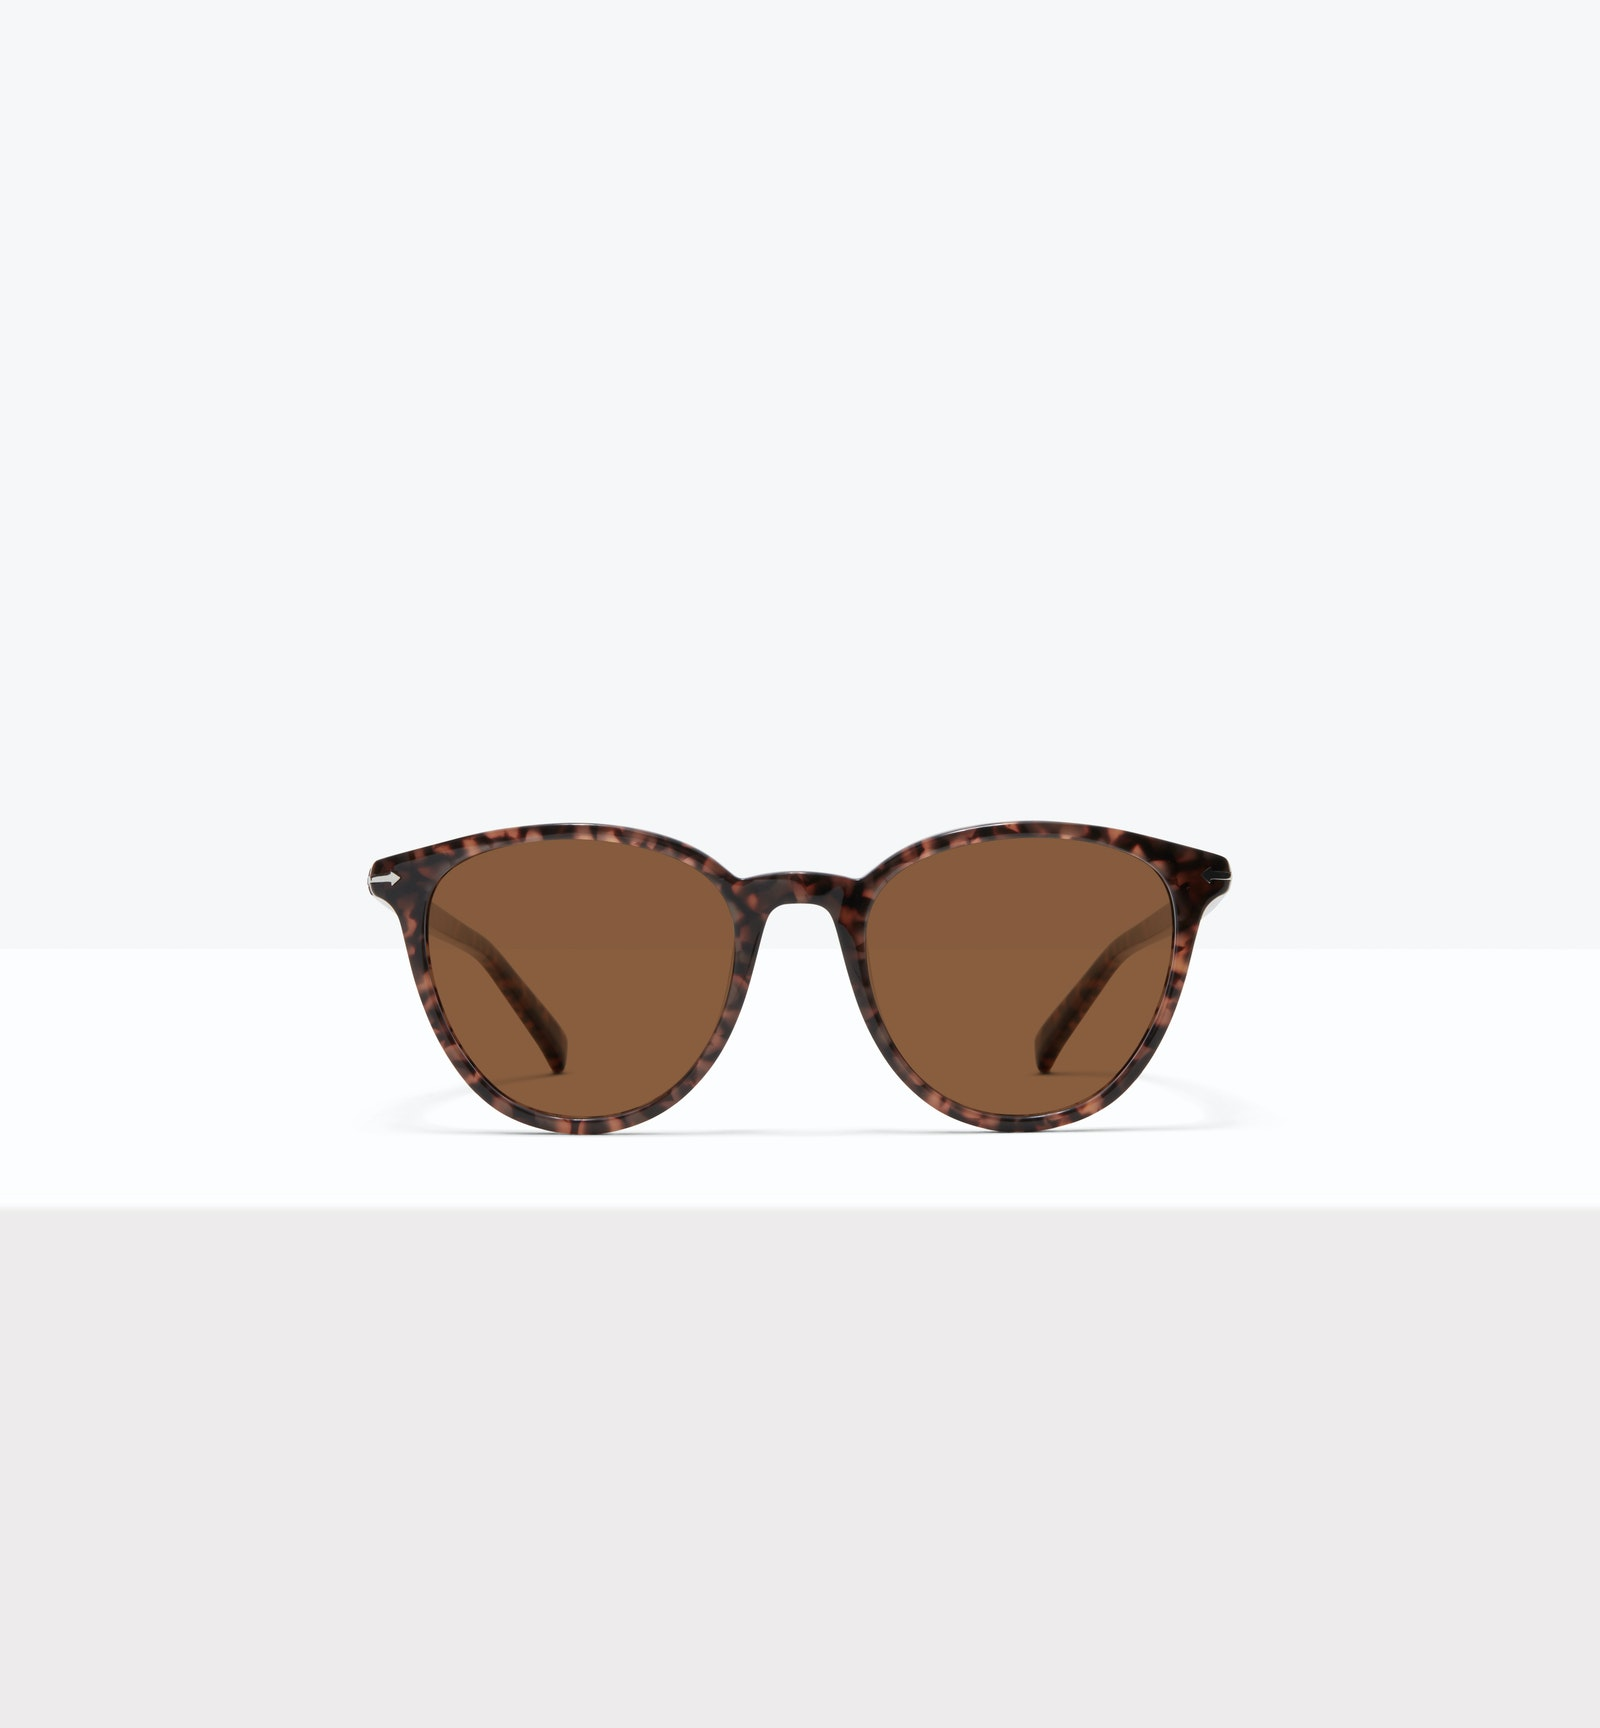 Affordable Fashion Glasses Round Sunglasses Women London M Leo